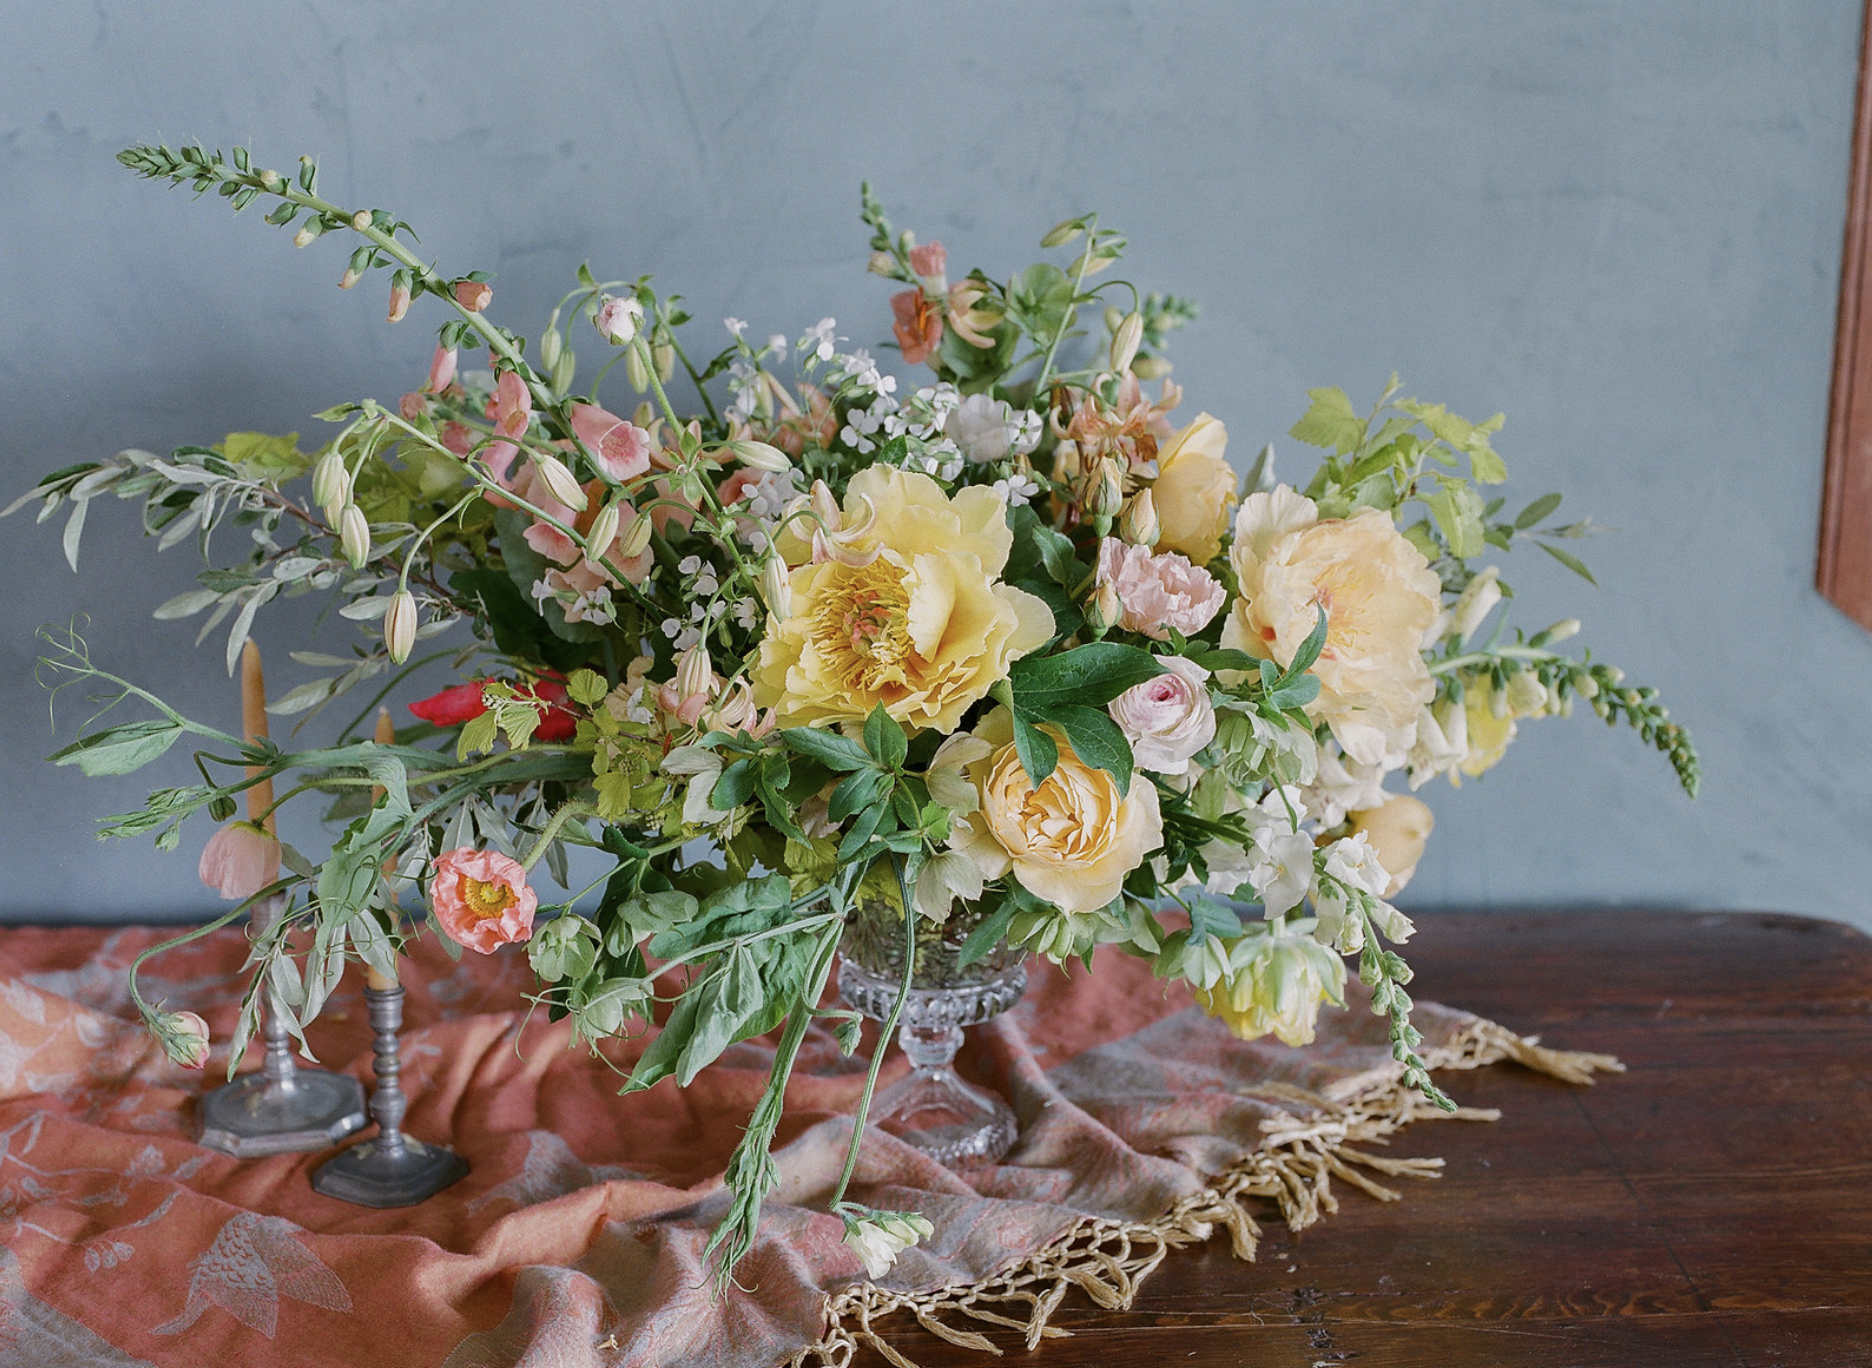 Floral Splendor  with Ariella Chezar